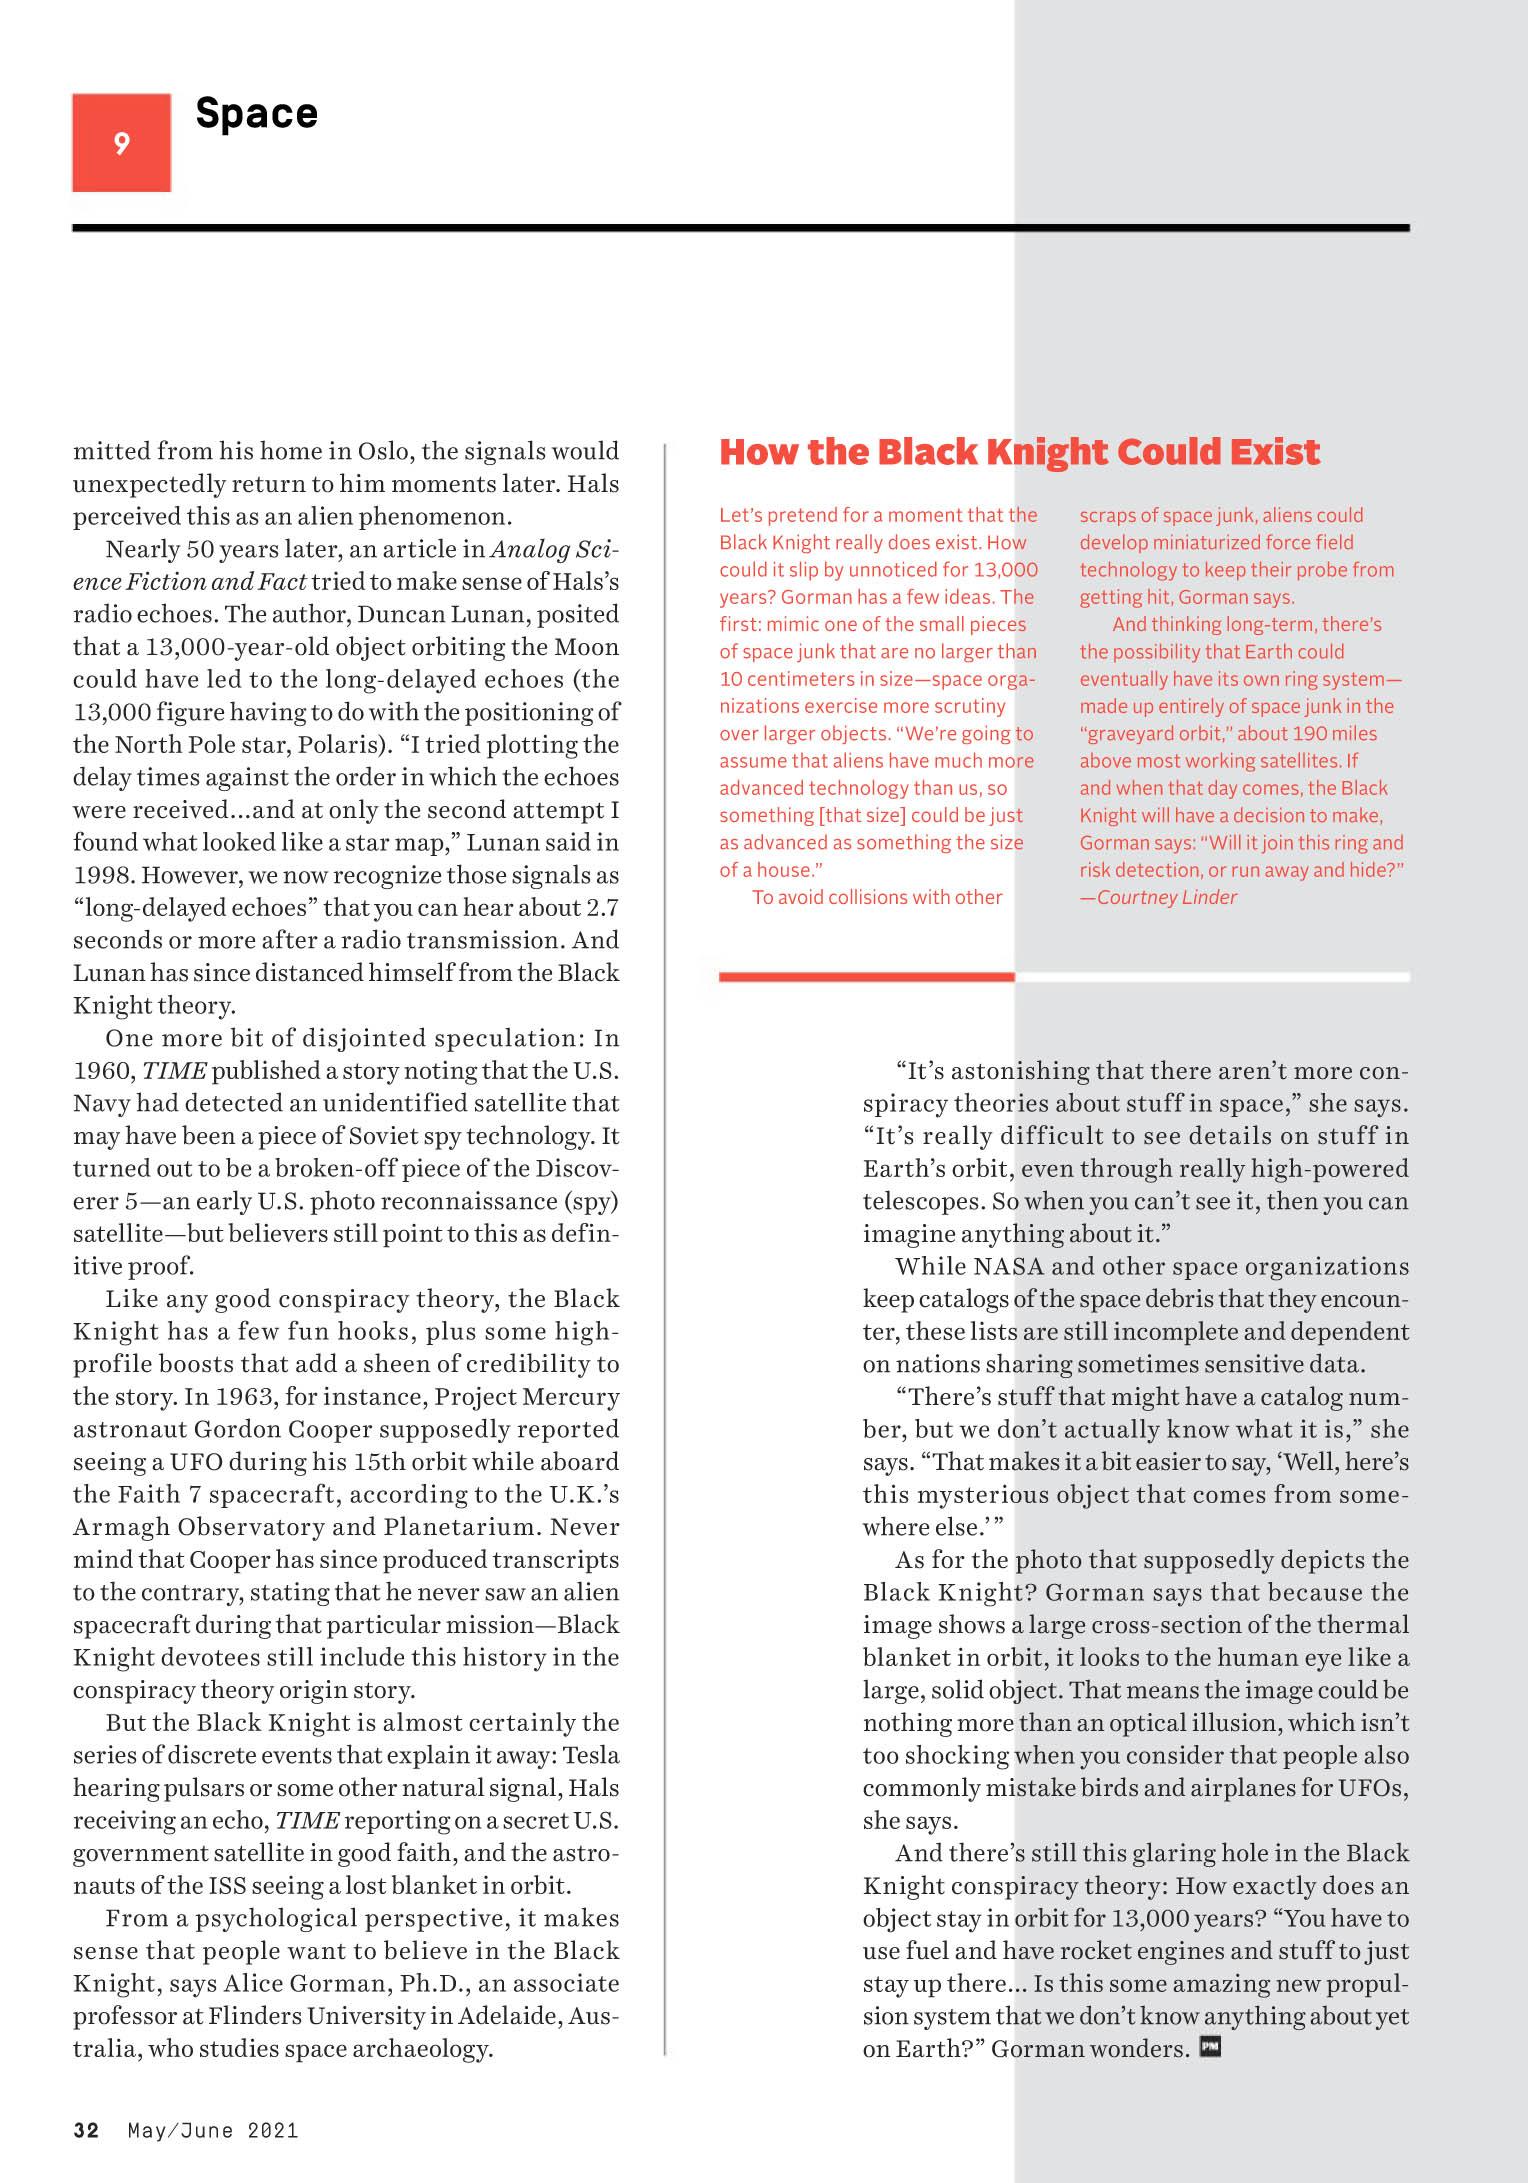 Popular Mechanics 2021-05-06 Black Knight 02.jpg